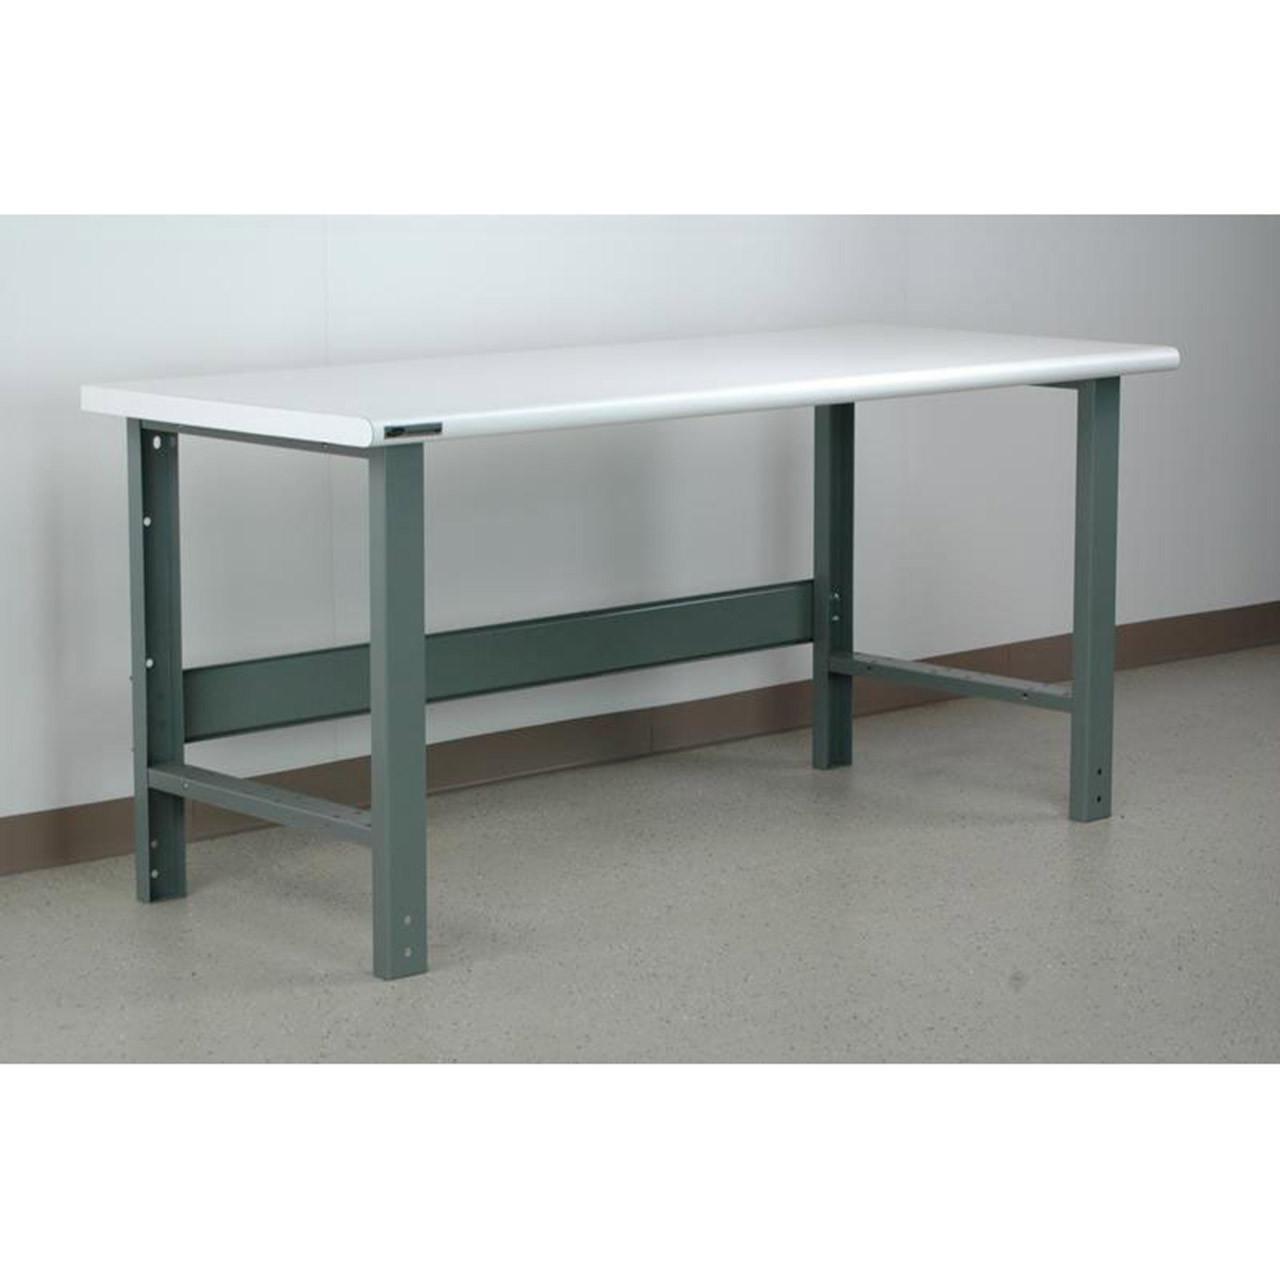 Standard Industrial Workbench Laminate